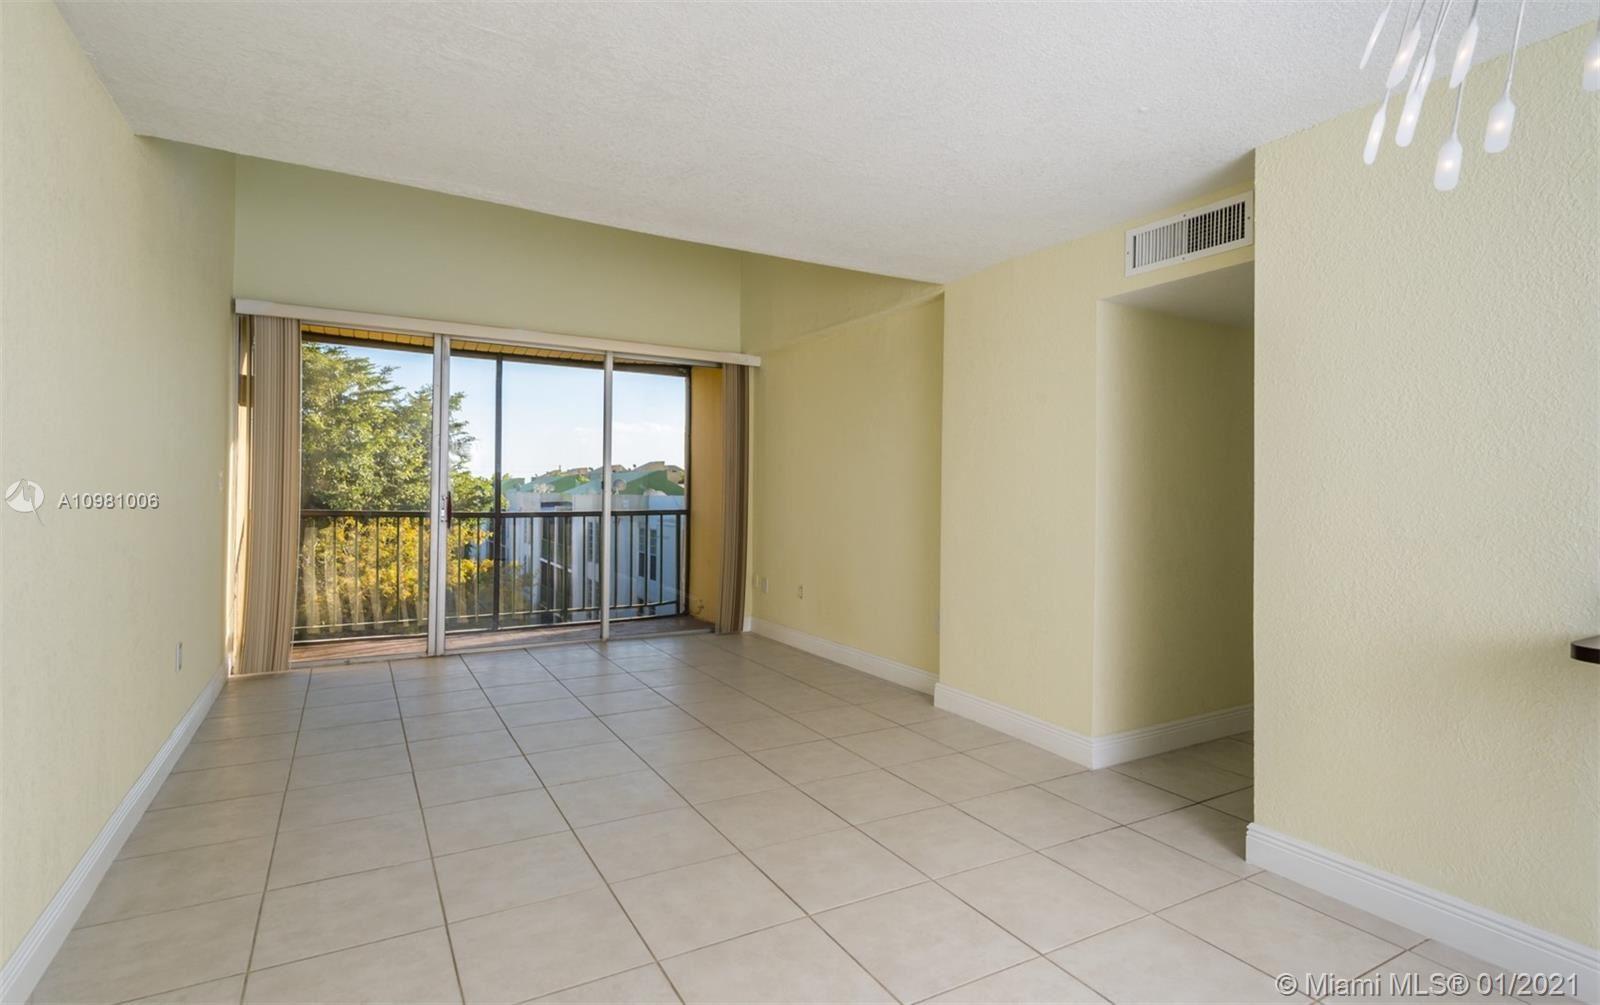 8820 Fontainebleau Blvd #506, Miami, FL 33172 - #: A10981006